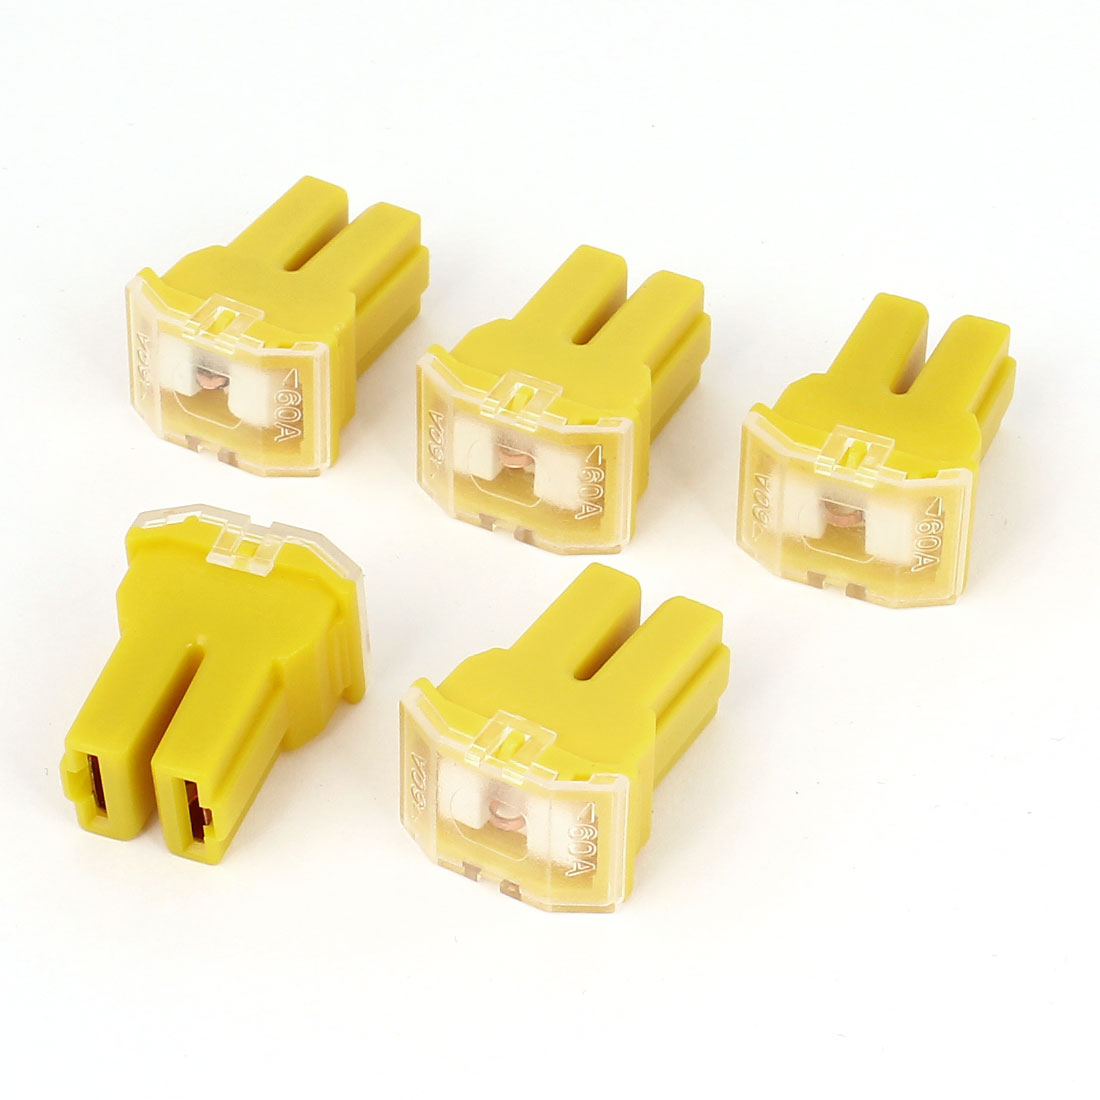 Unique Bargains 5 Pcs Yellow 60A 32V Female Plug in  Cartridge PAL Fuse for Car